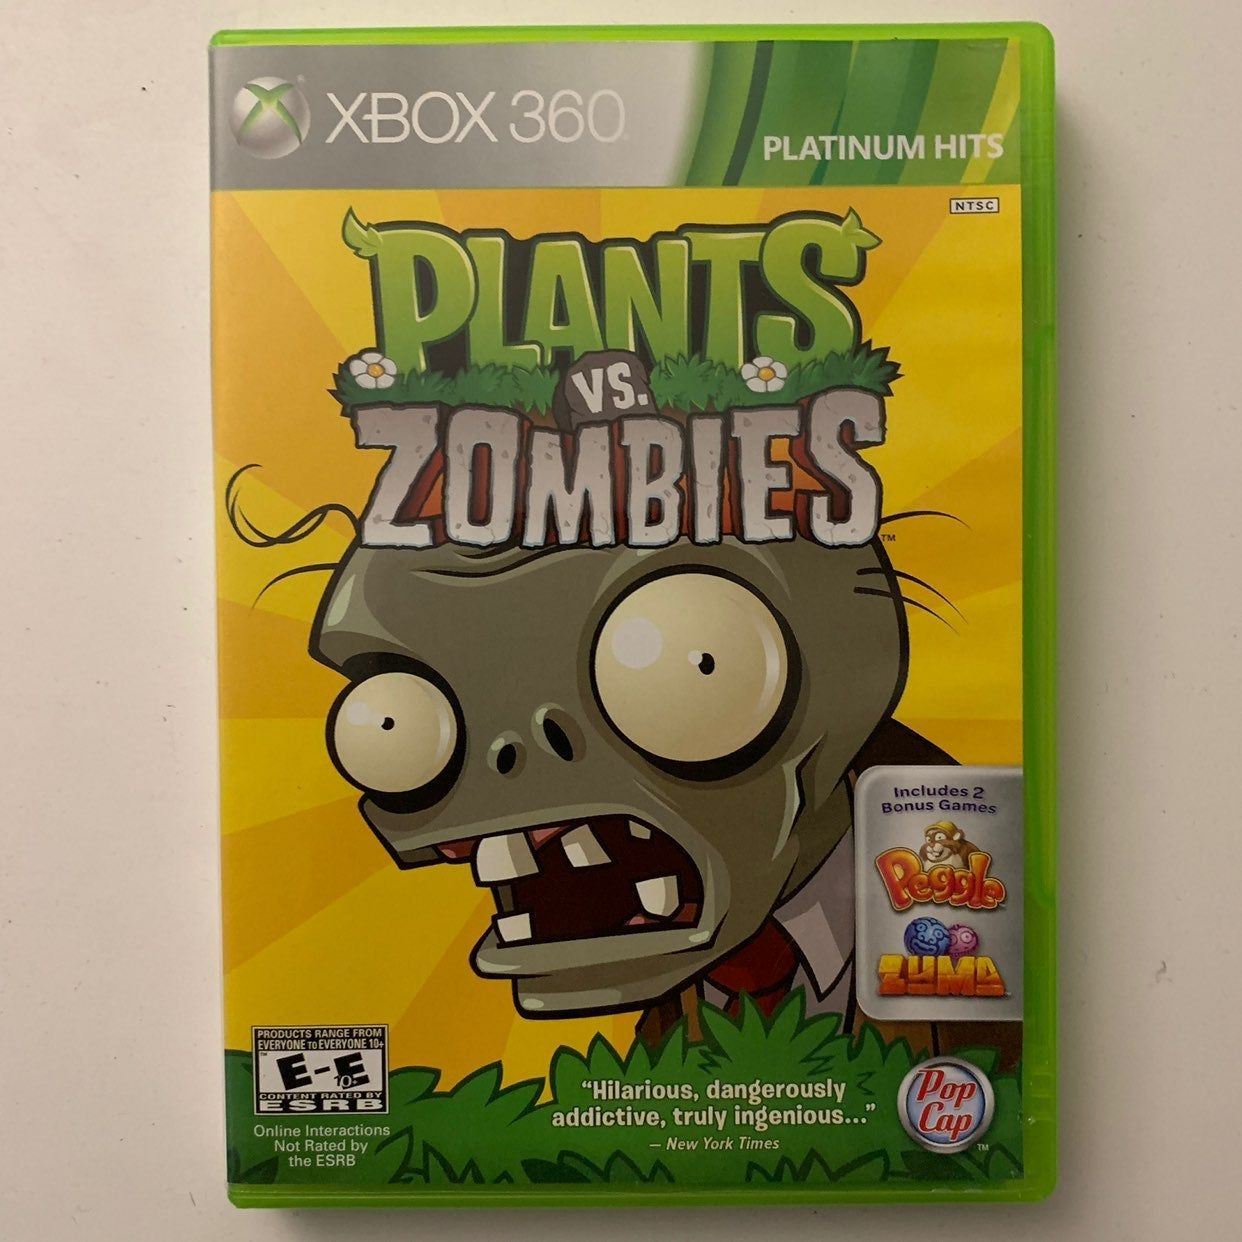 Xbox 360 Game Plants Vs Zombies On Mercari Xbox 360 Games Xbox Xbox 360